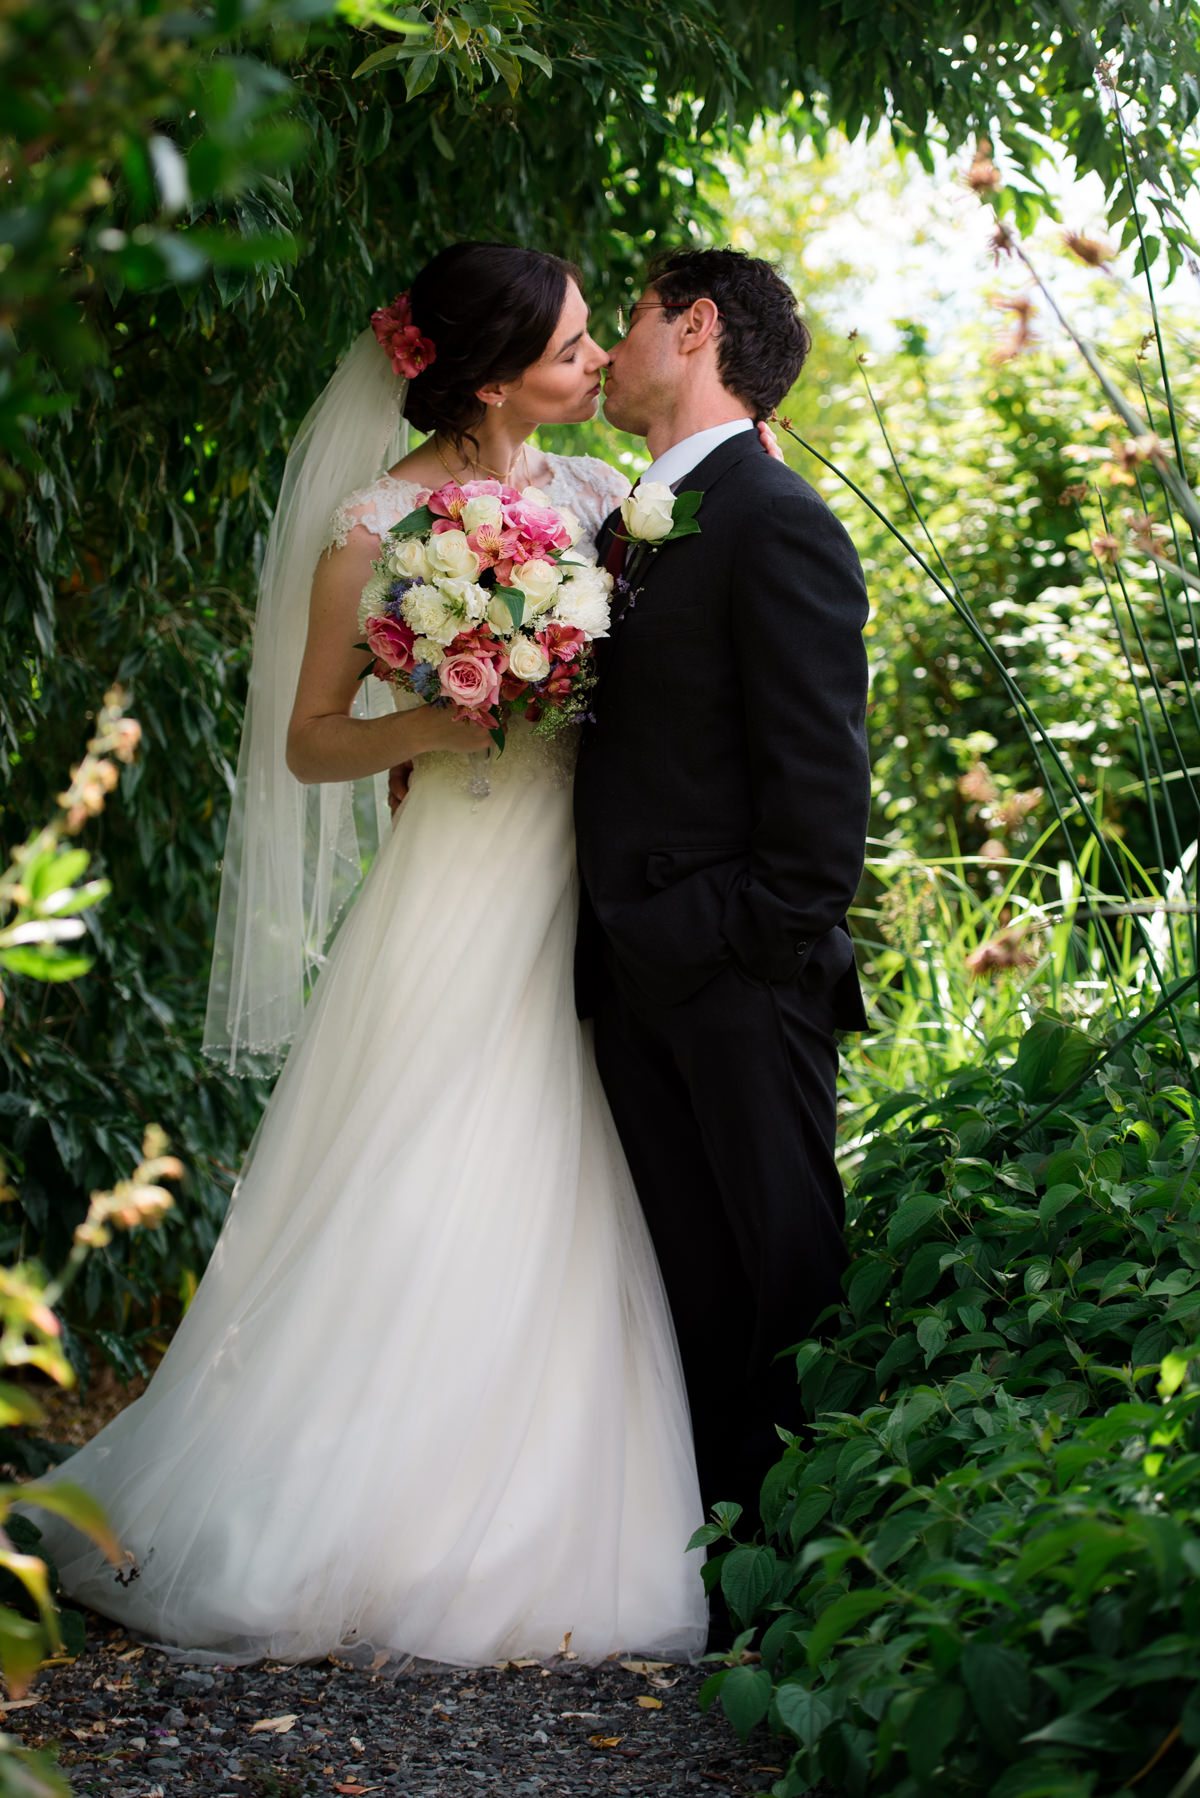 Andrew Tat - Documentary Wedding Photography - Kirkland, Washington - Emily & Cuauh - 25.JPG